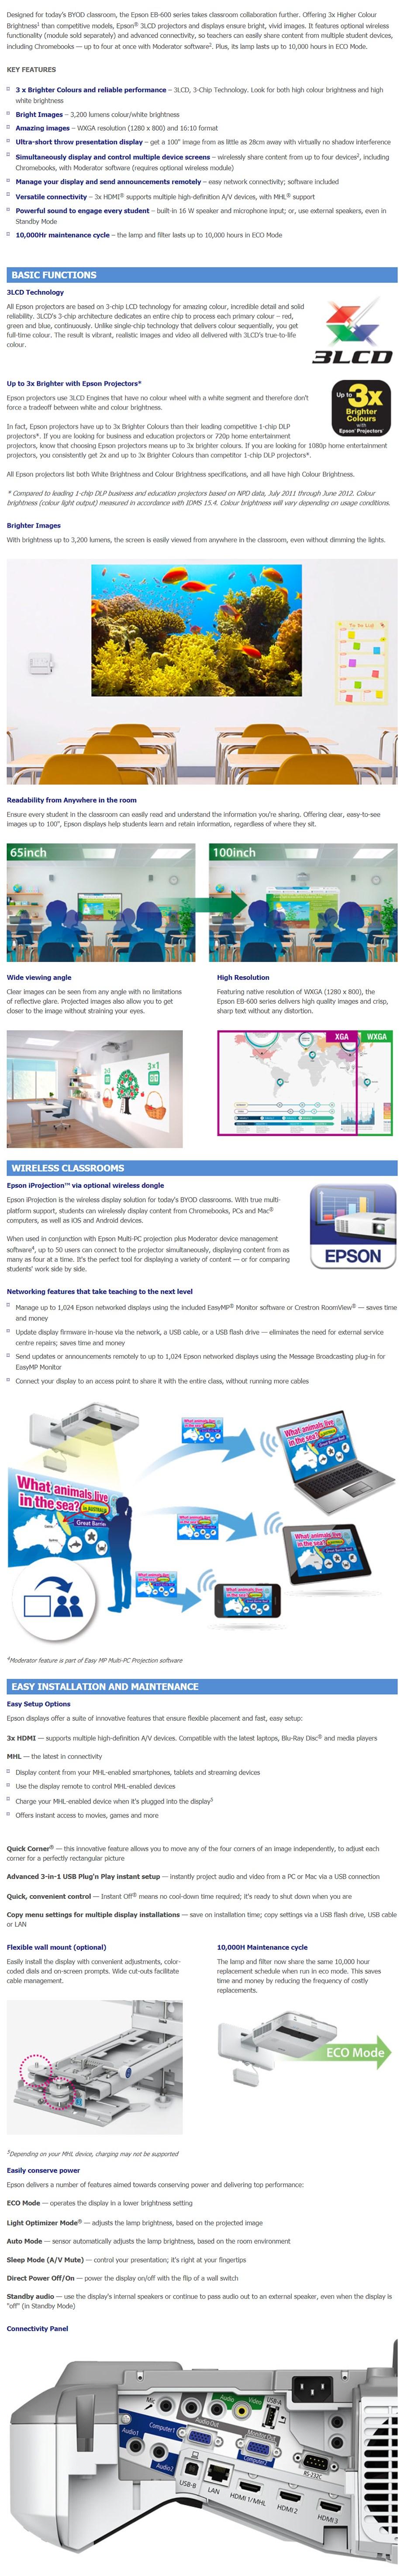 Epson EB-675W WXGA 3LCD Ultra Short Throw Data Projector - Desktop Overview 1